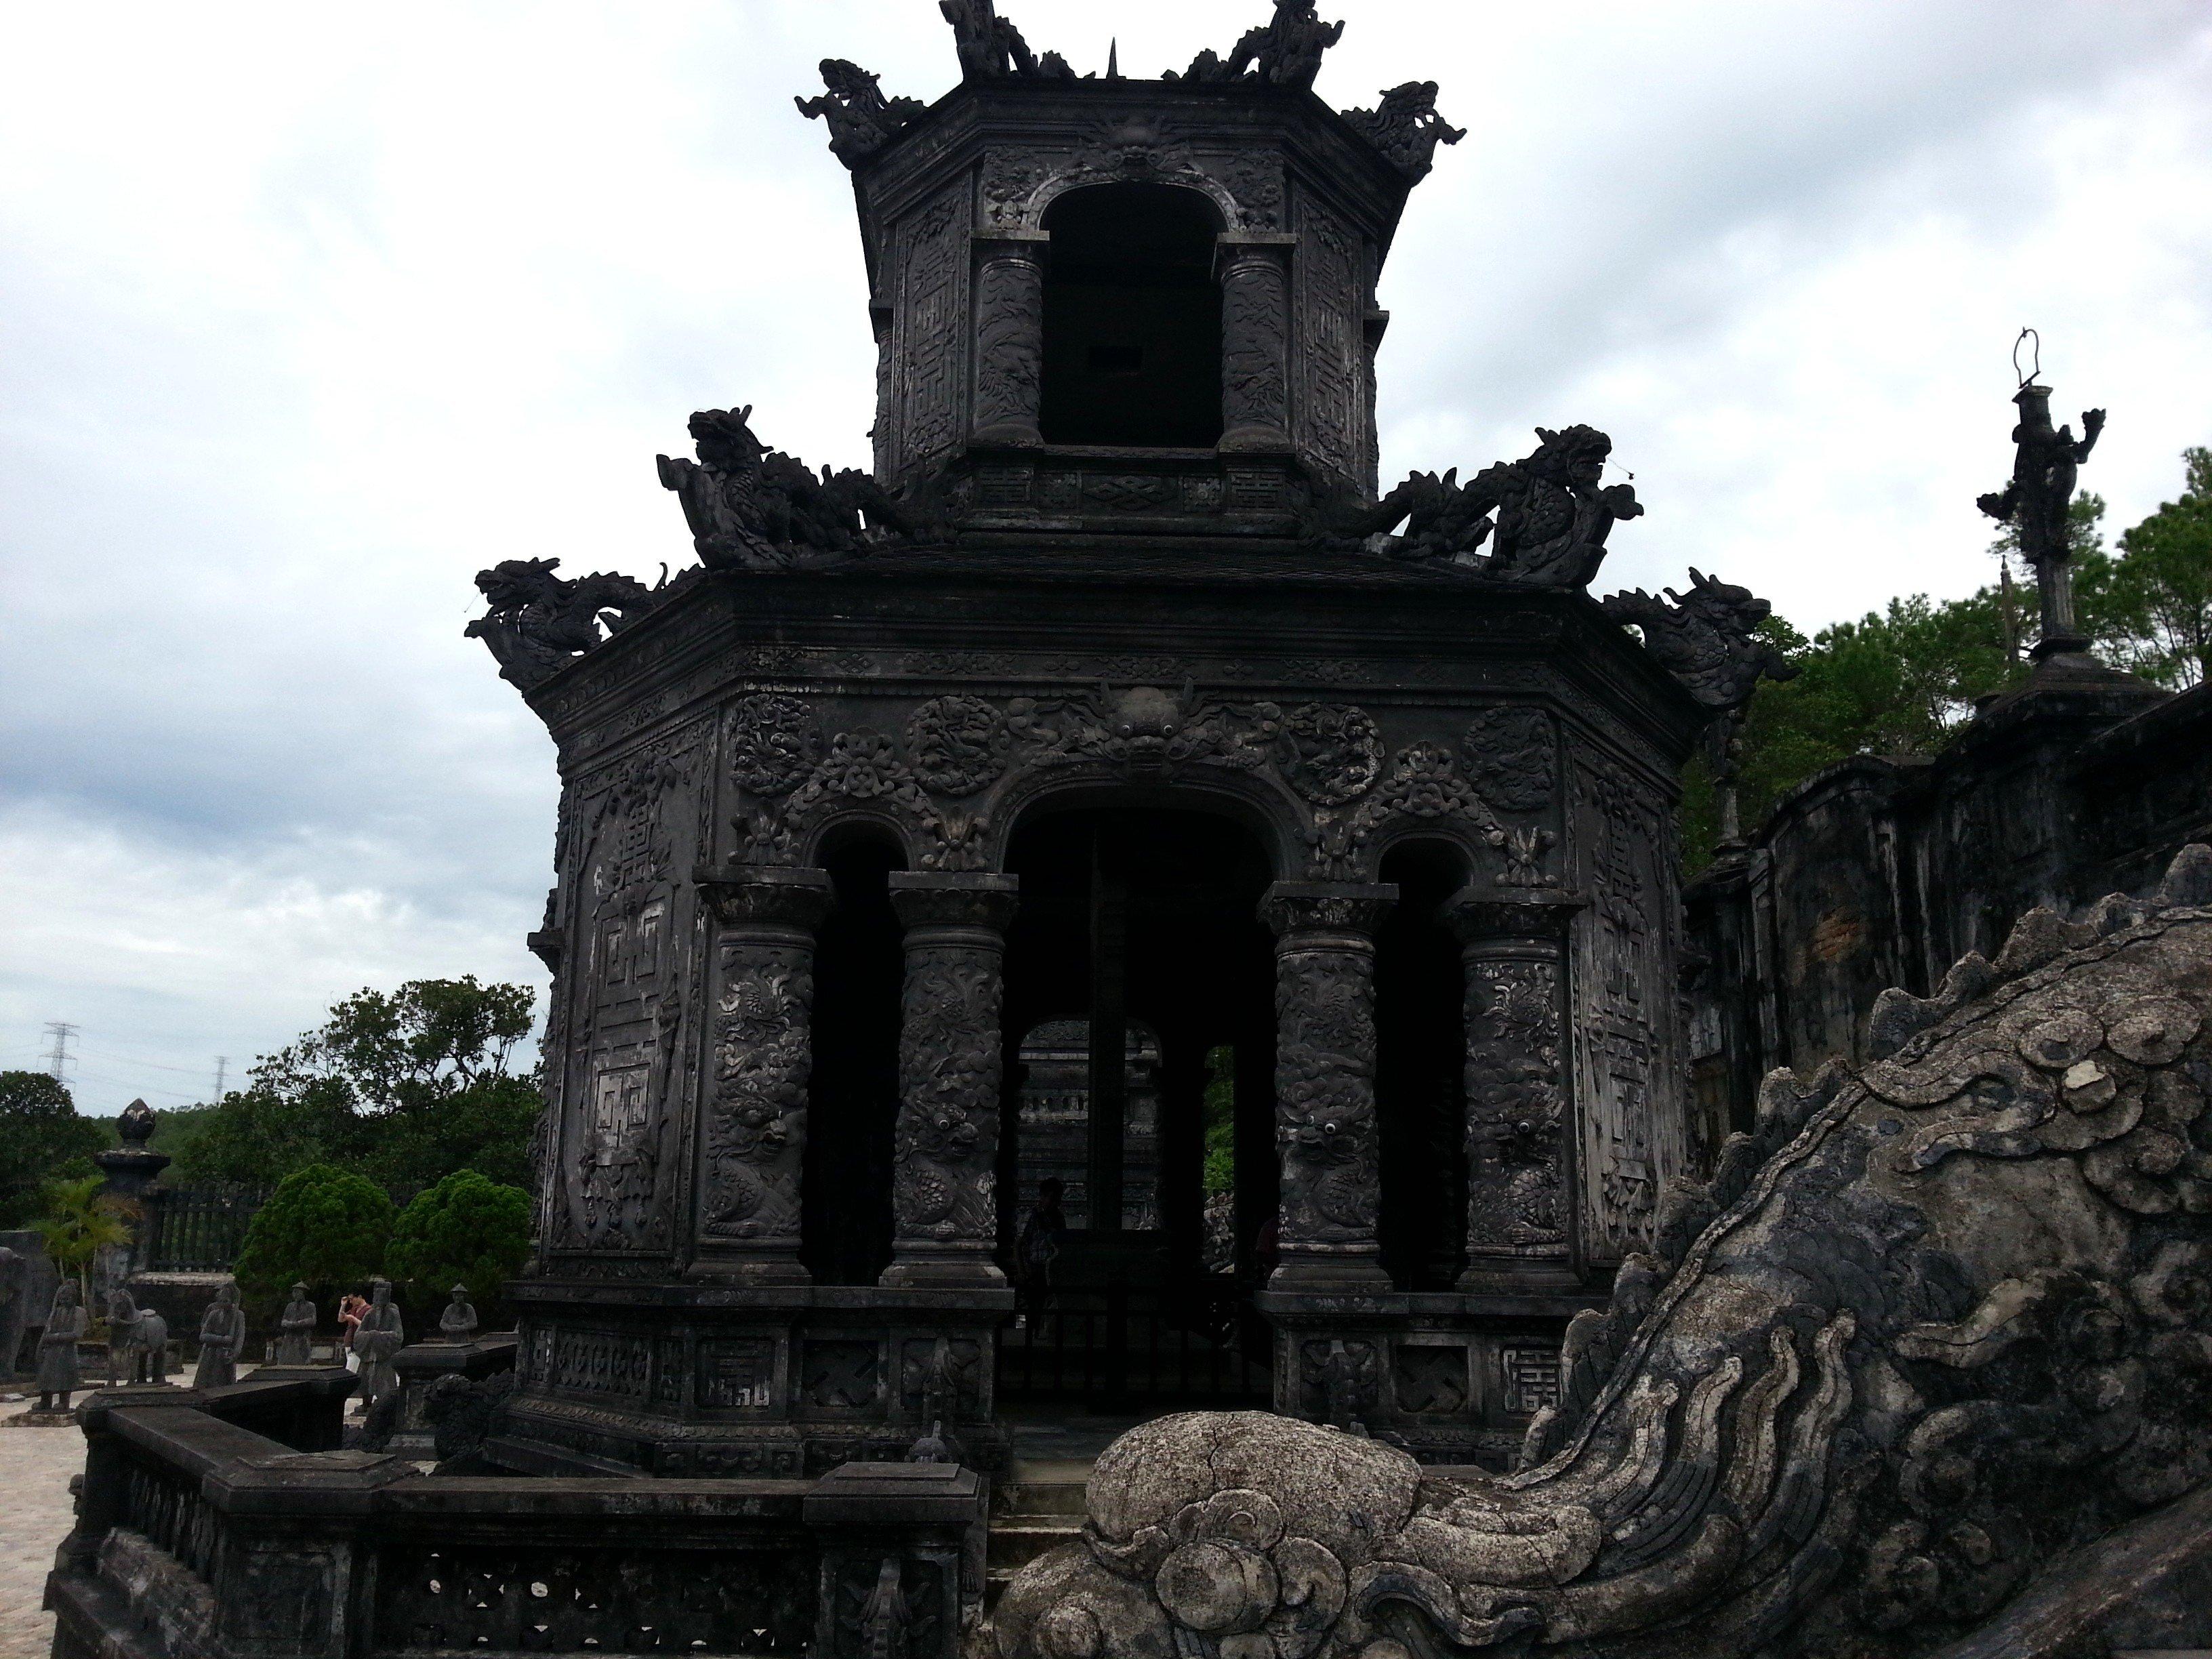 Stele Pavilion at the Tomb of Khai Dinh